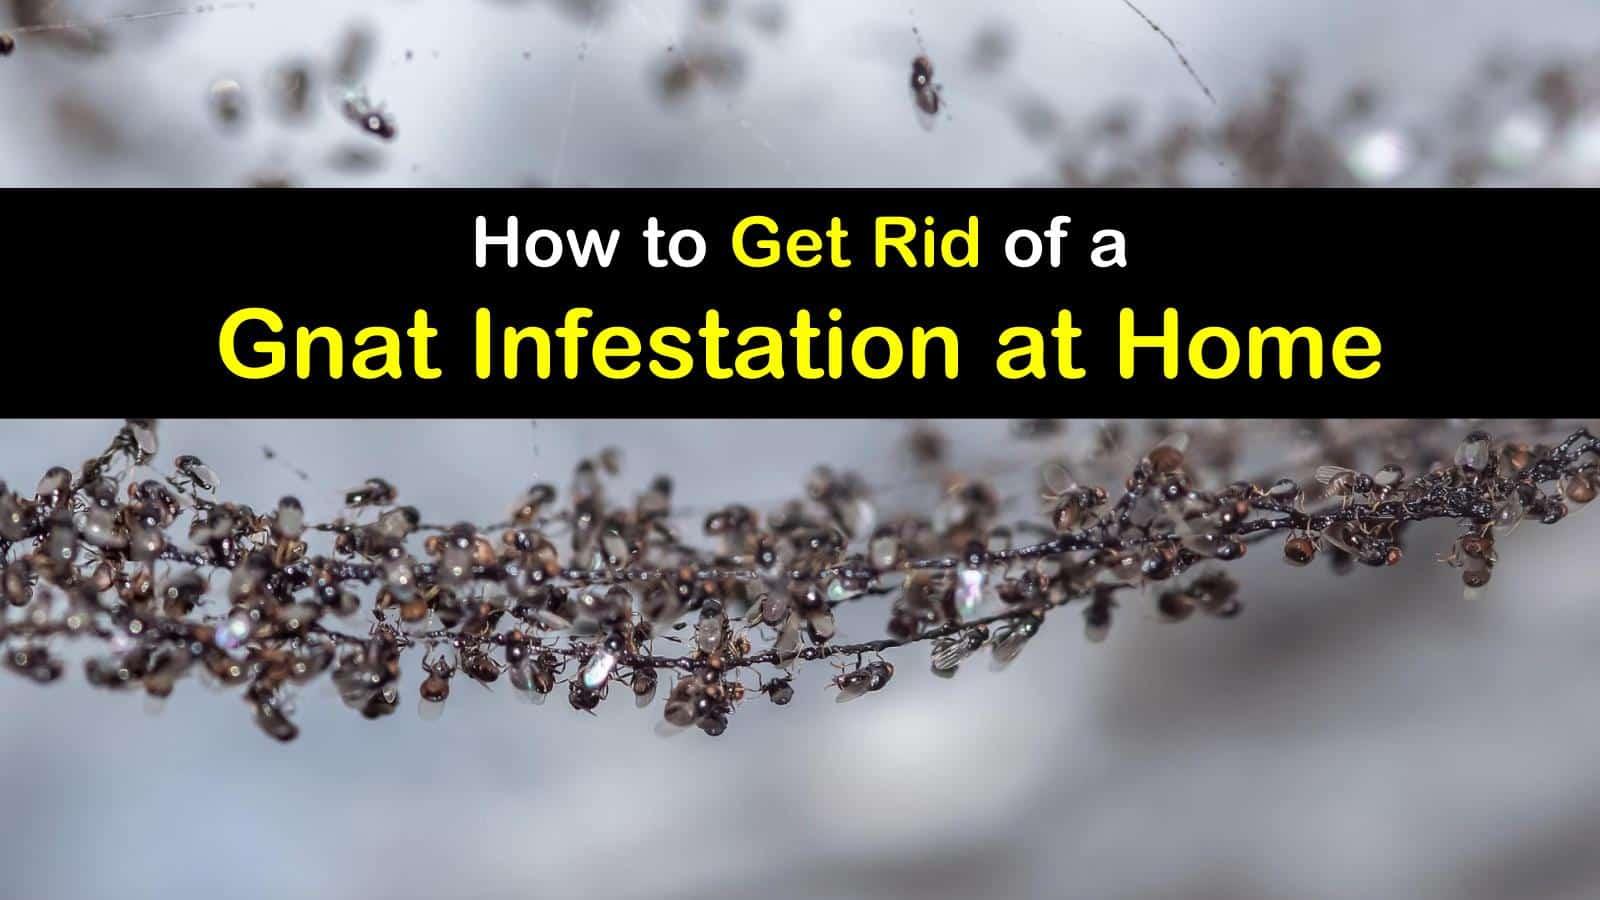 gnat infestation titleimg1